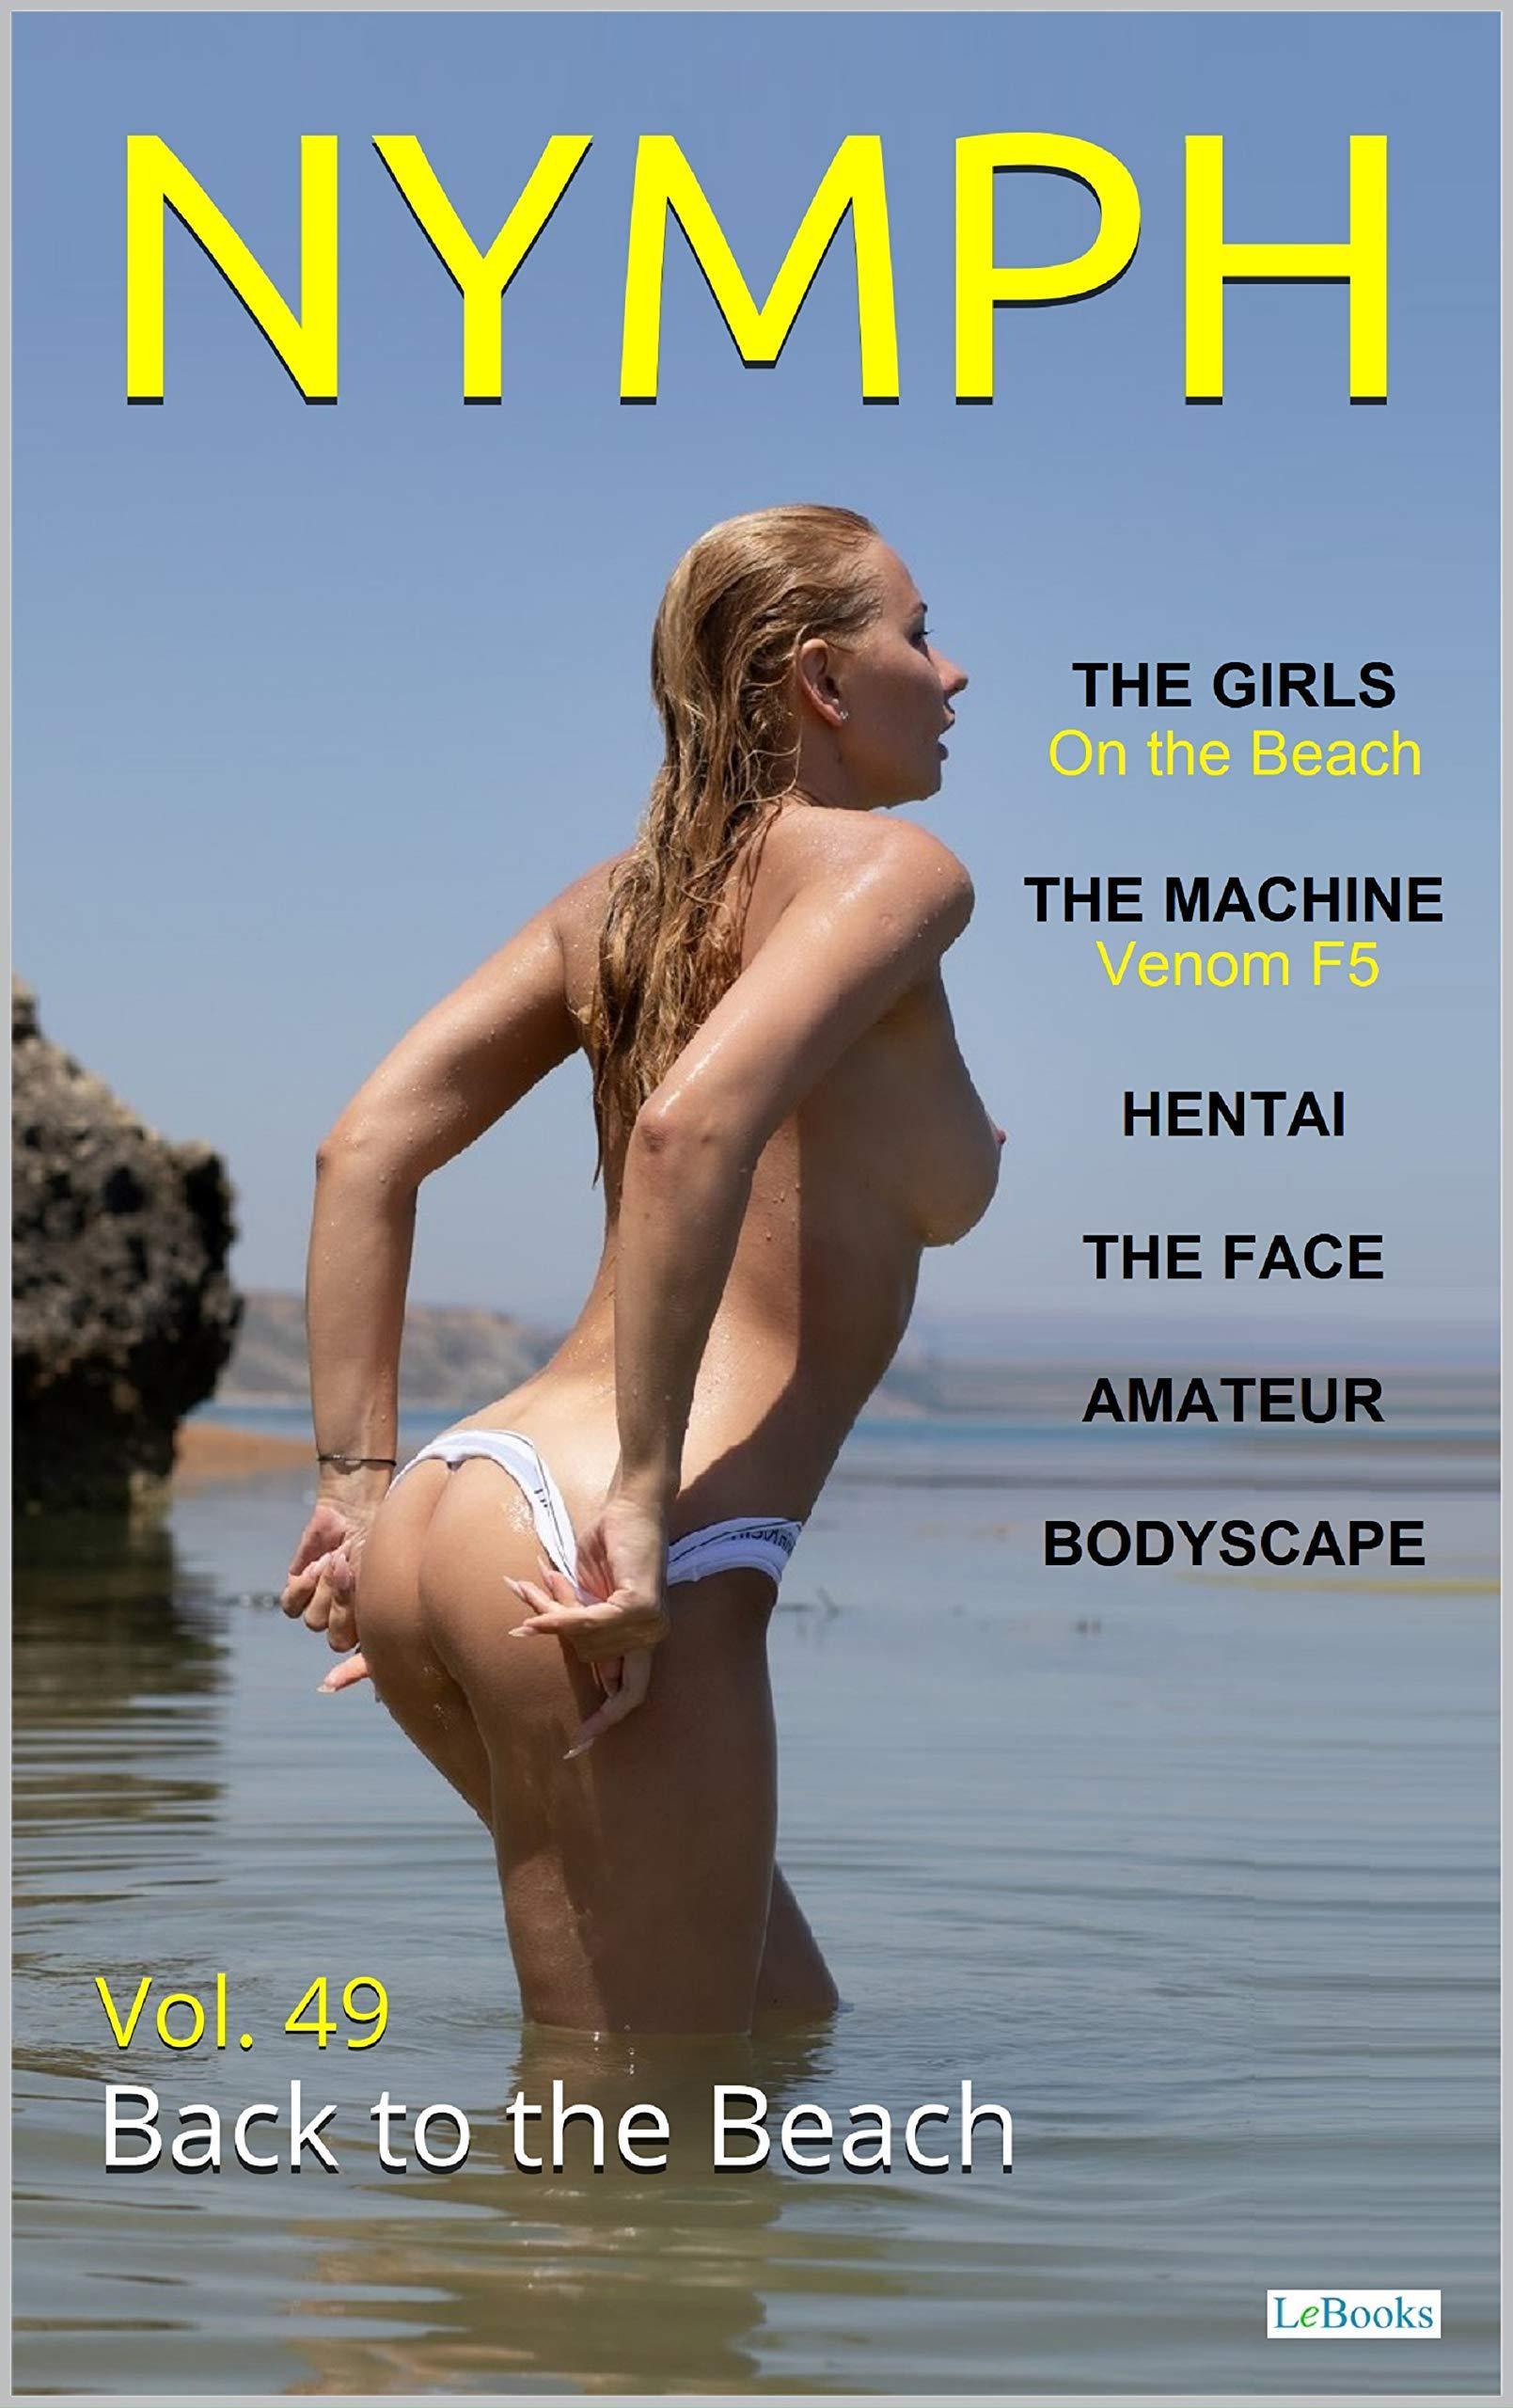 NYMPH - Vol 49: Back to the Beach